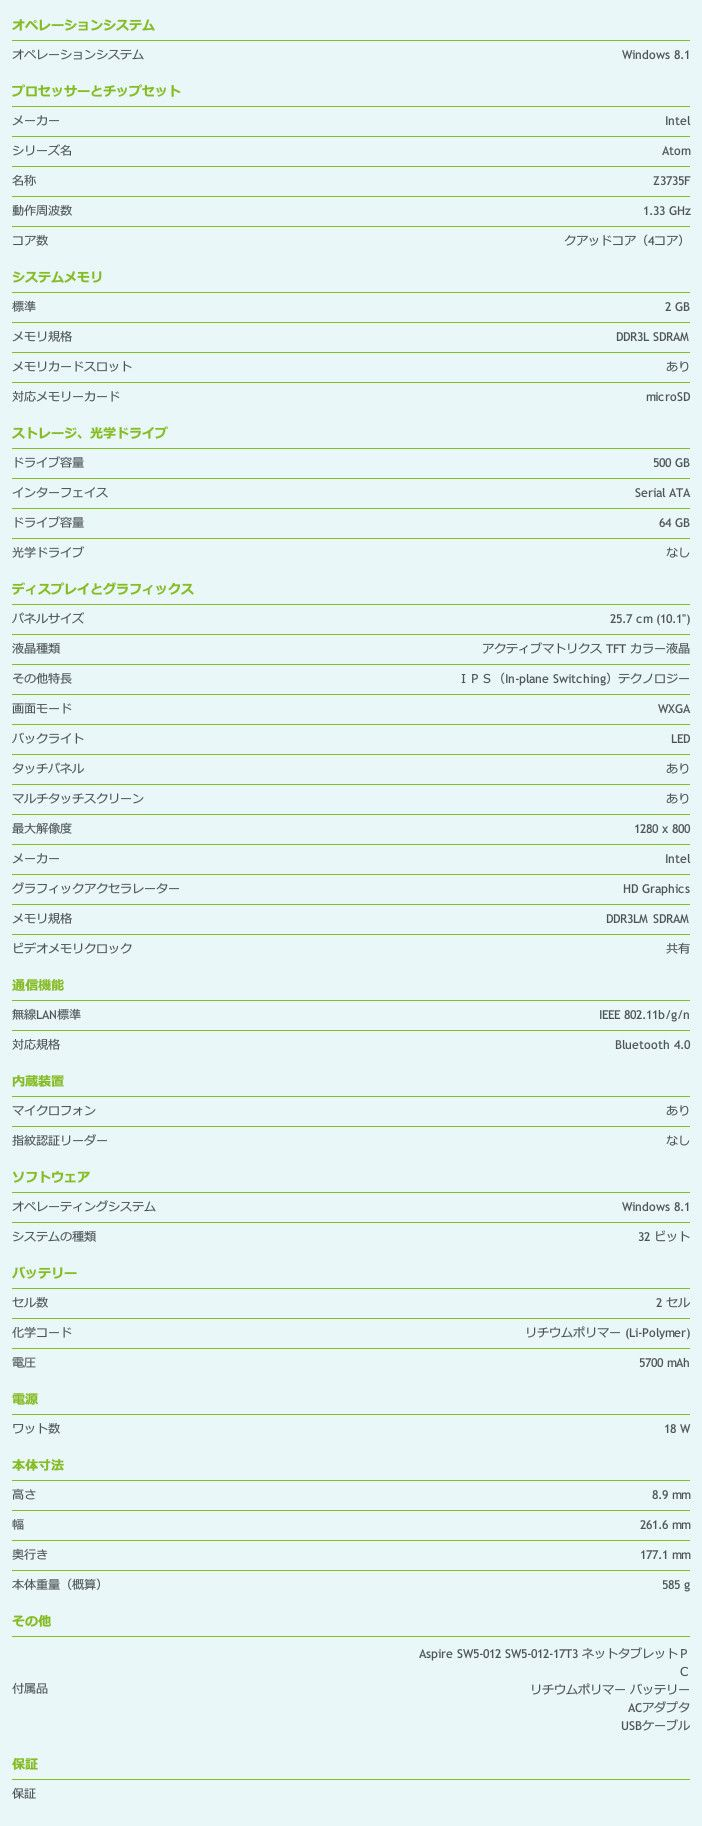 acer Aspire Switch 10 スペック表